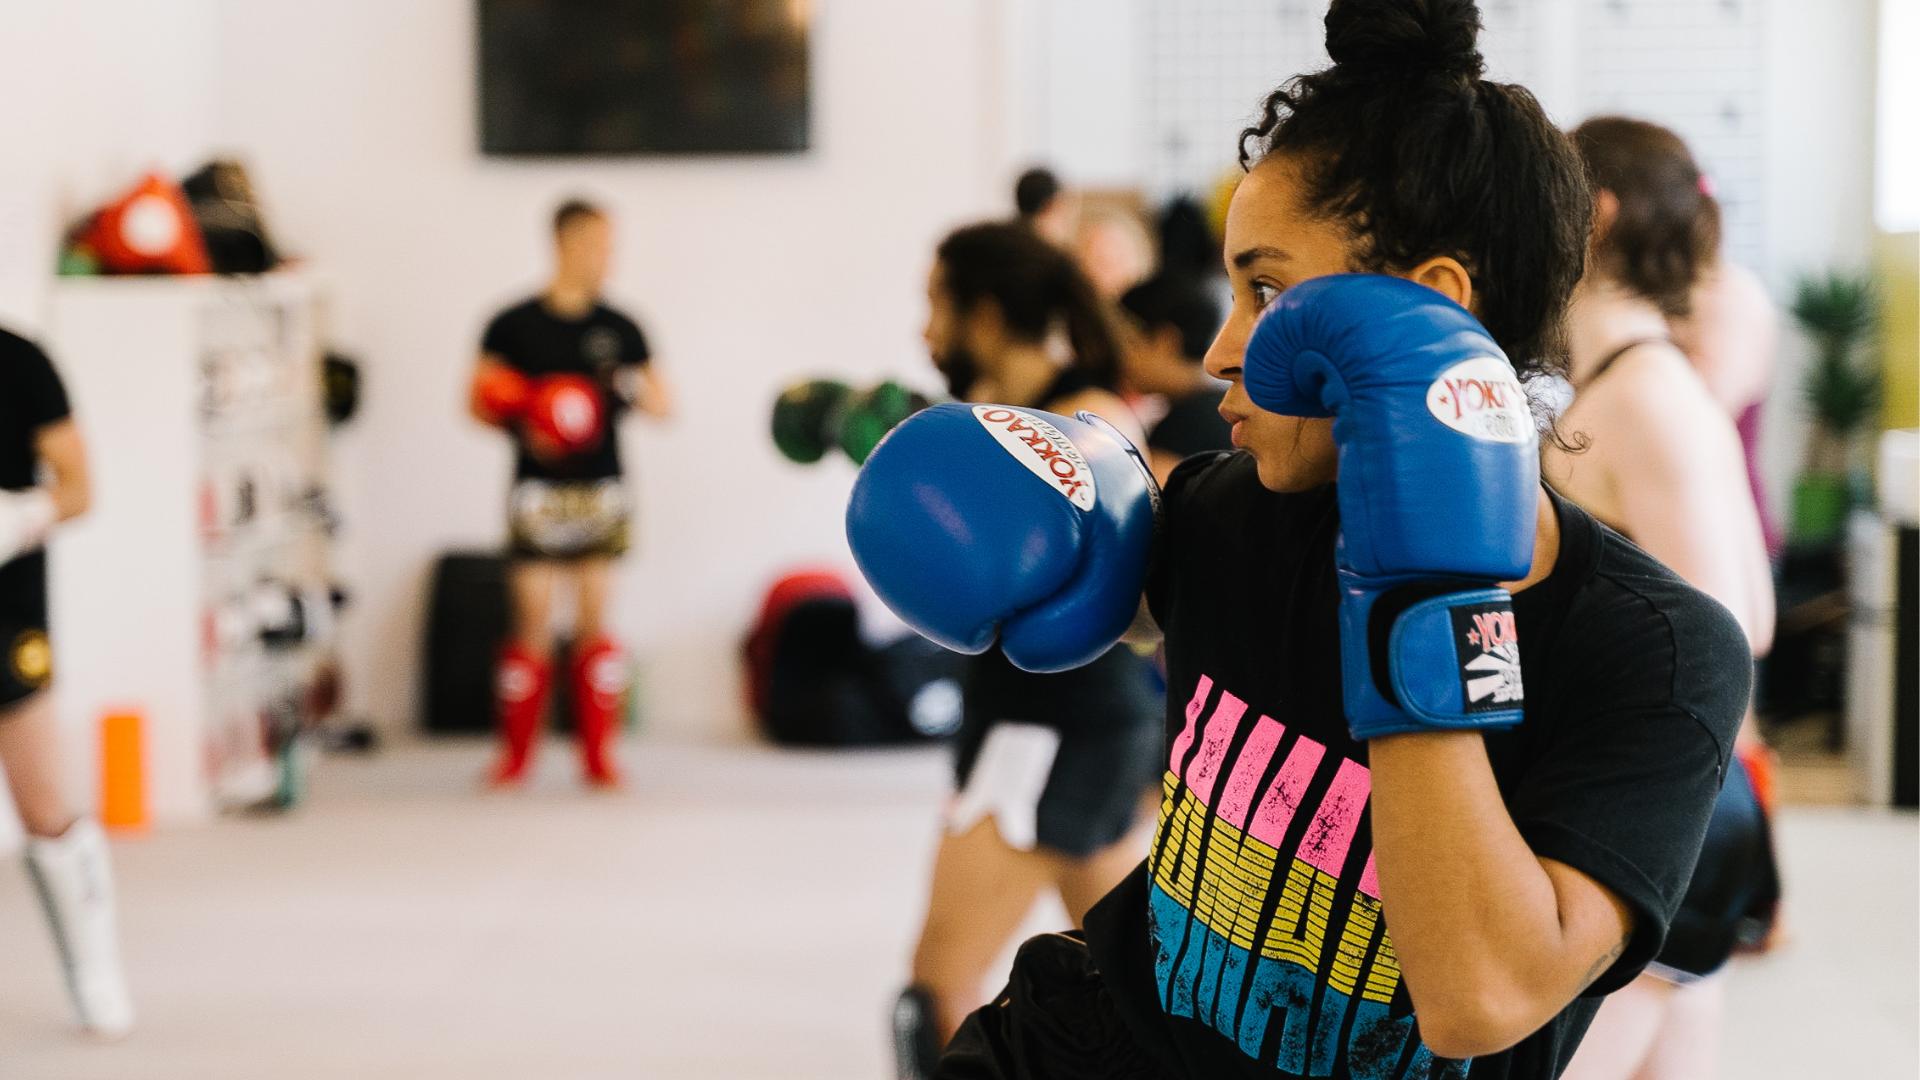 Muay Thai Toronto training at montrait Muay Thai Downtown Toronto location